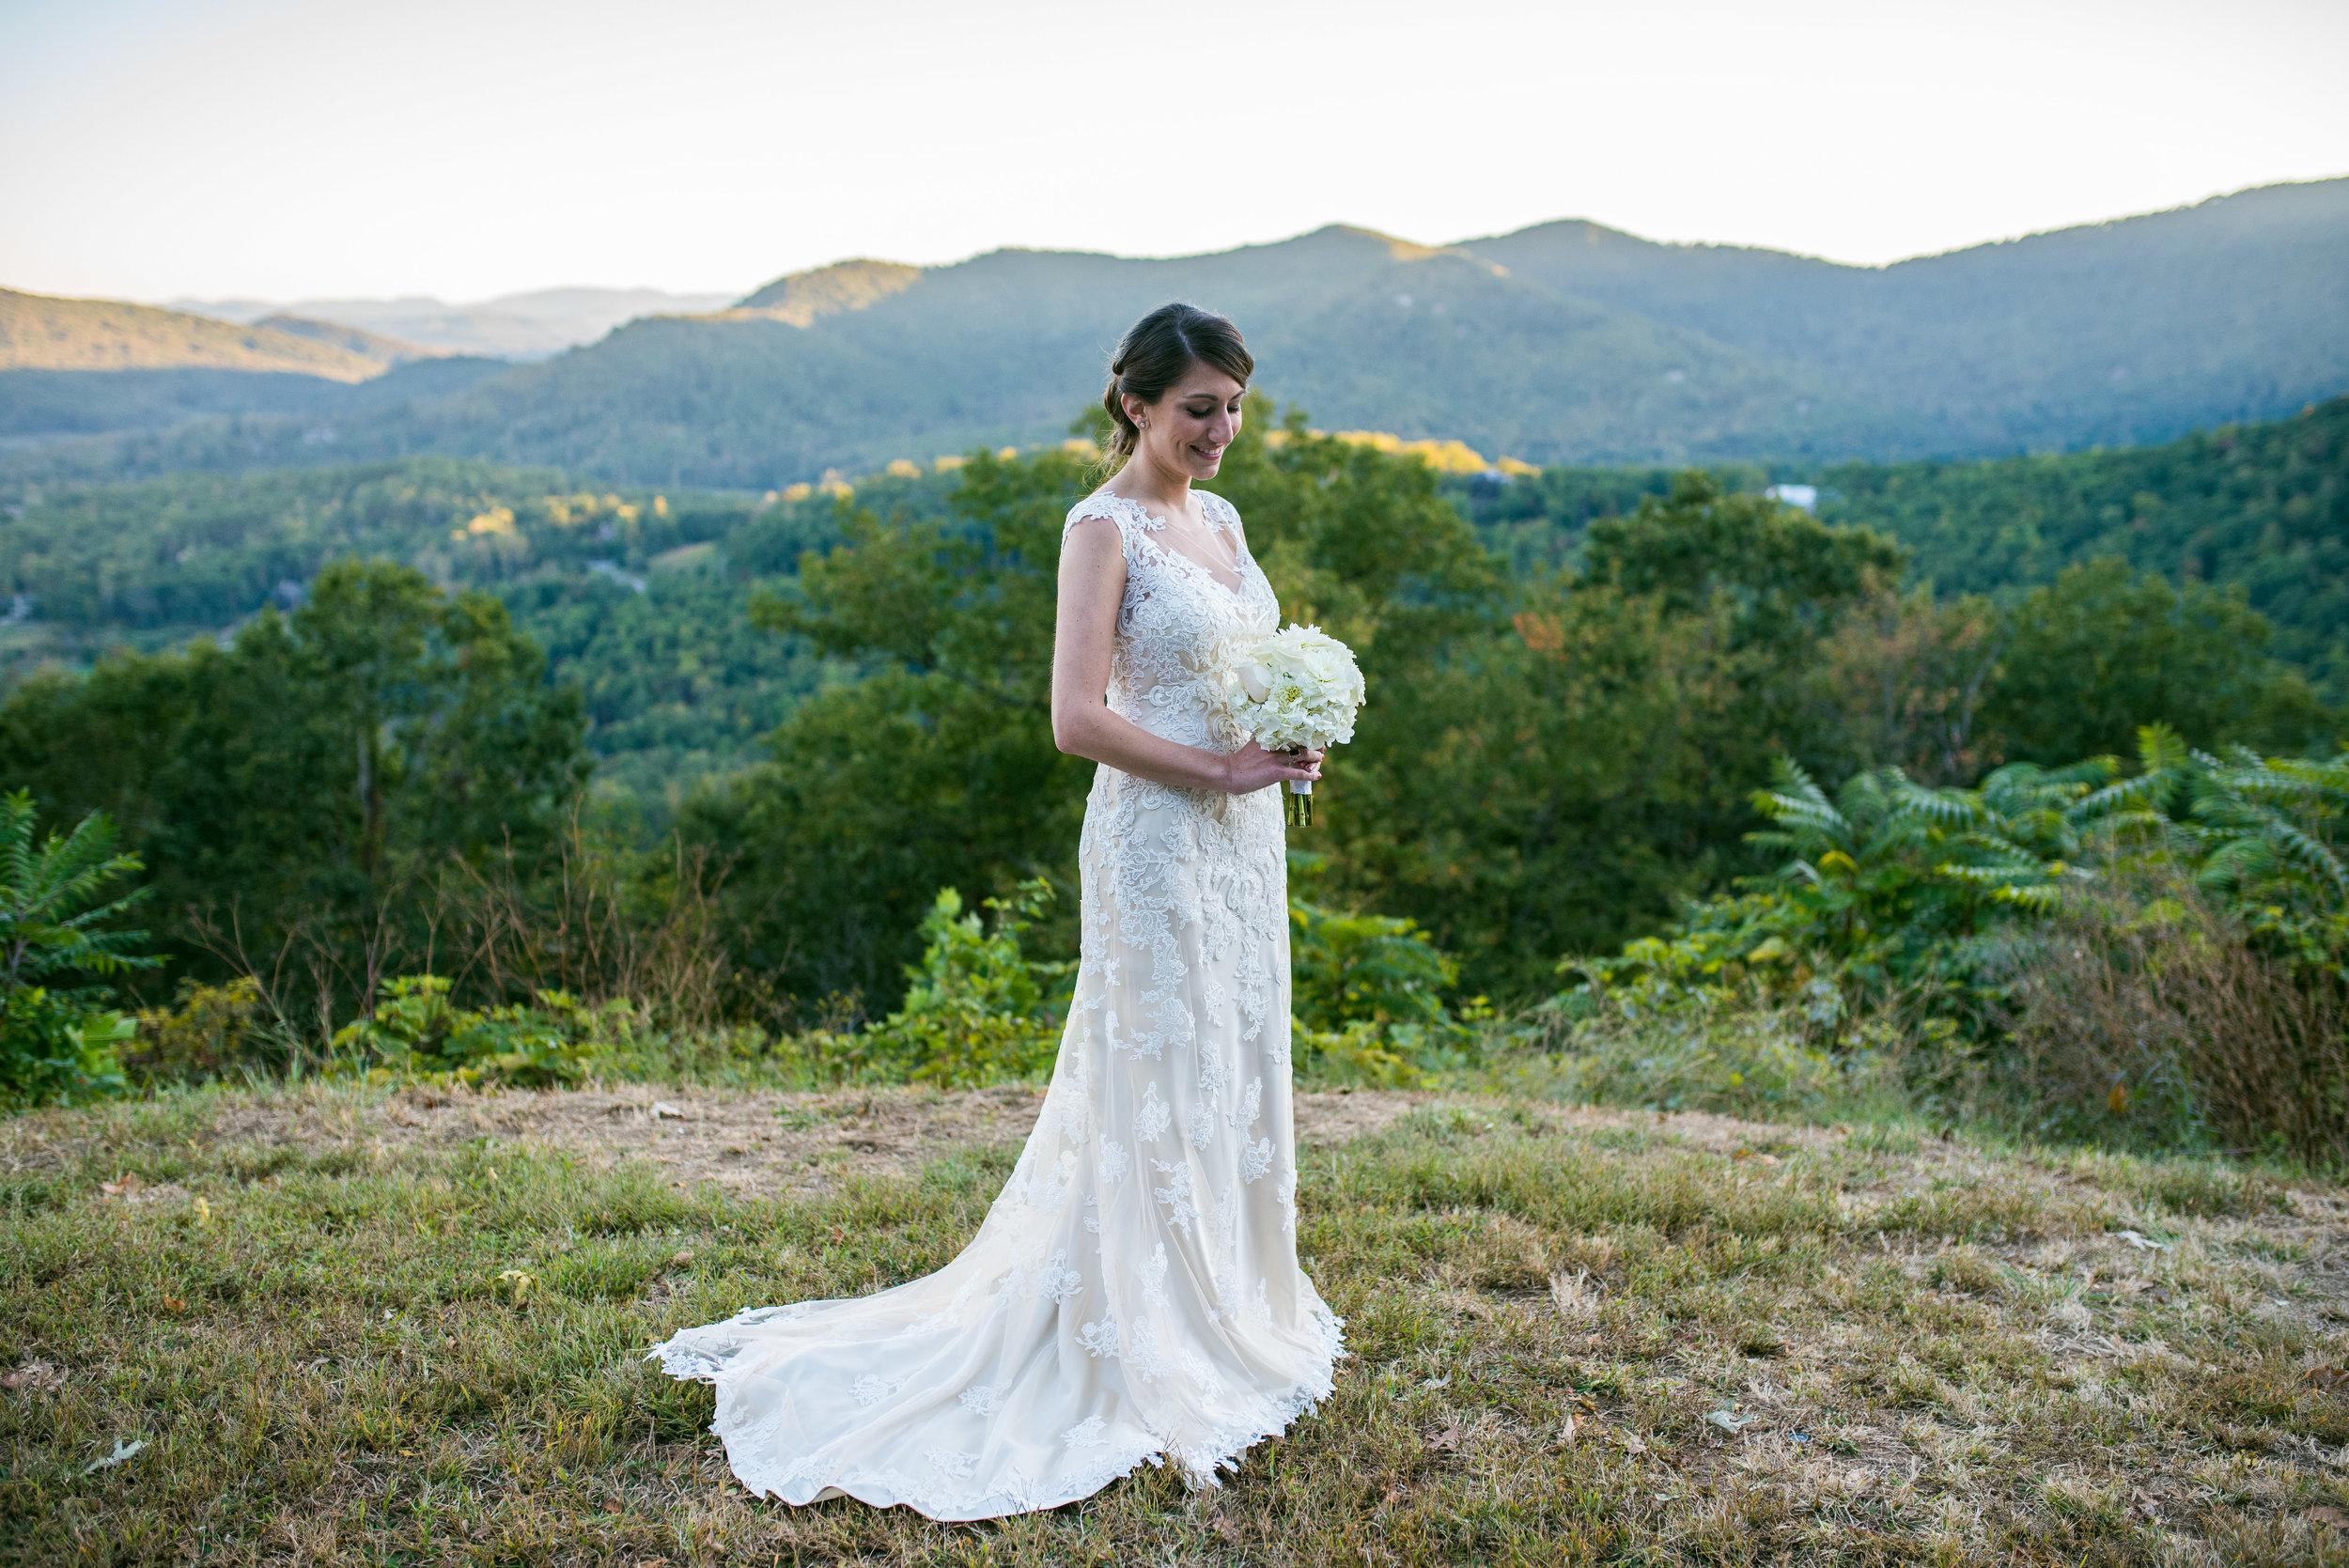 Mountaintop Bridal Portraits - Asheville Wedding Photographer